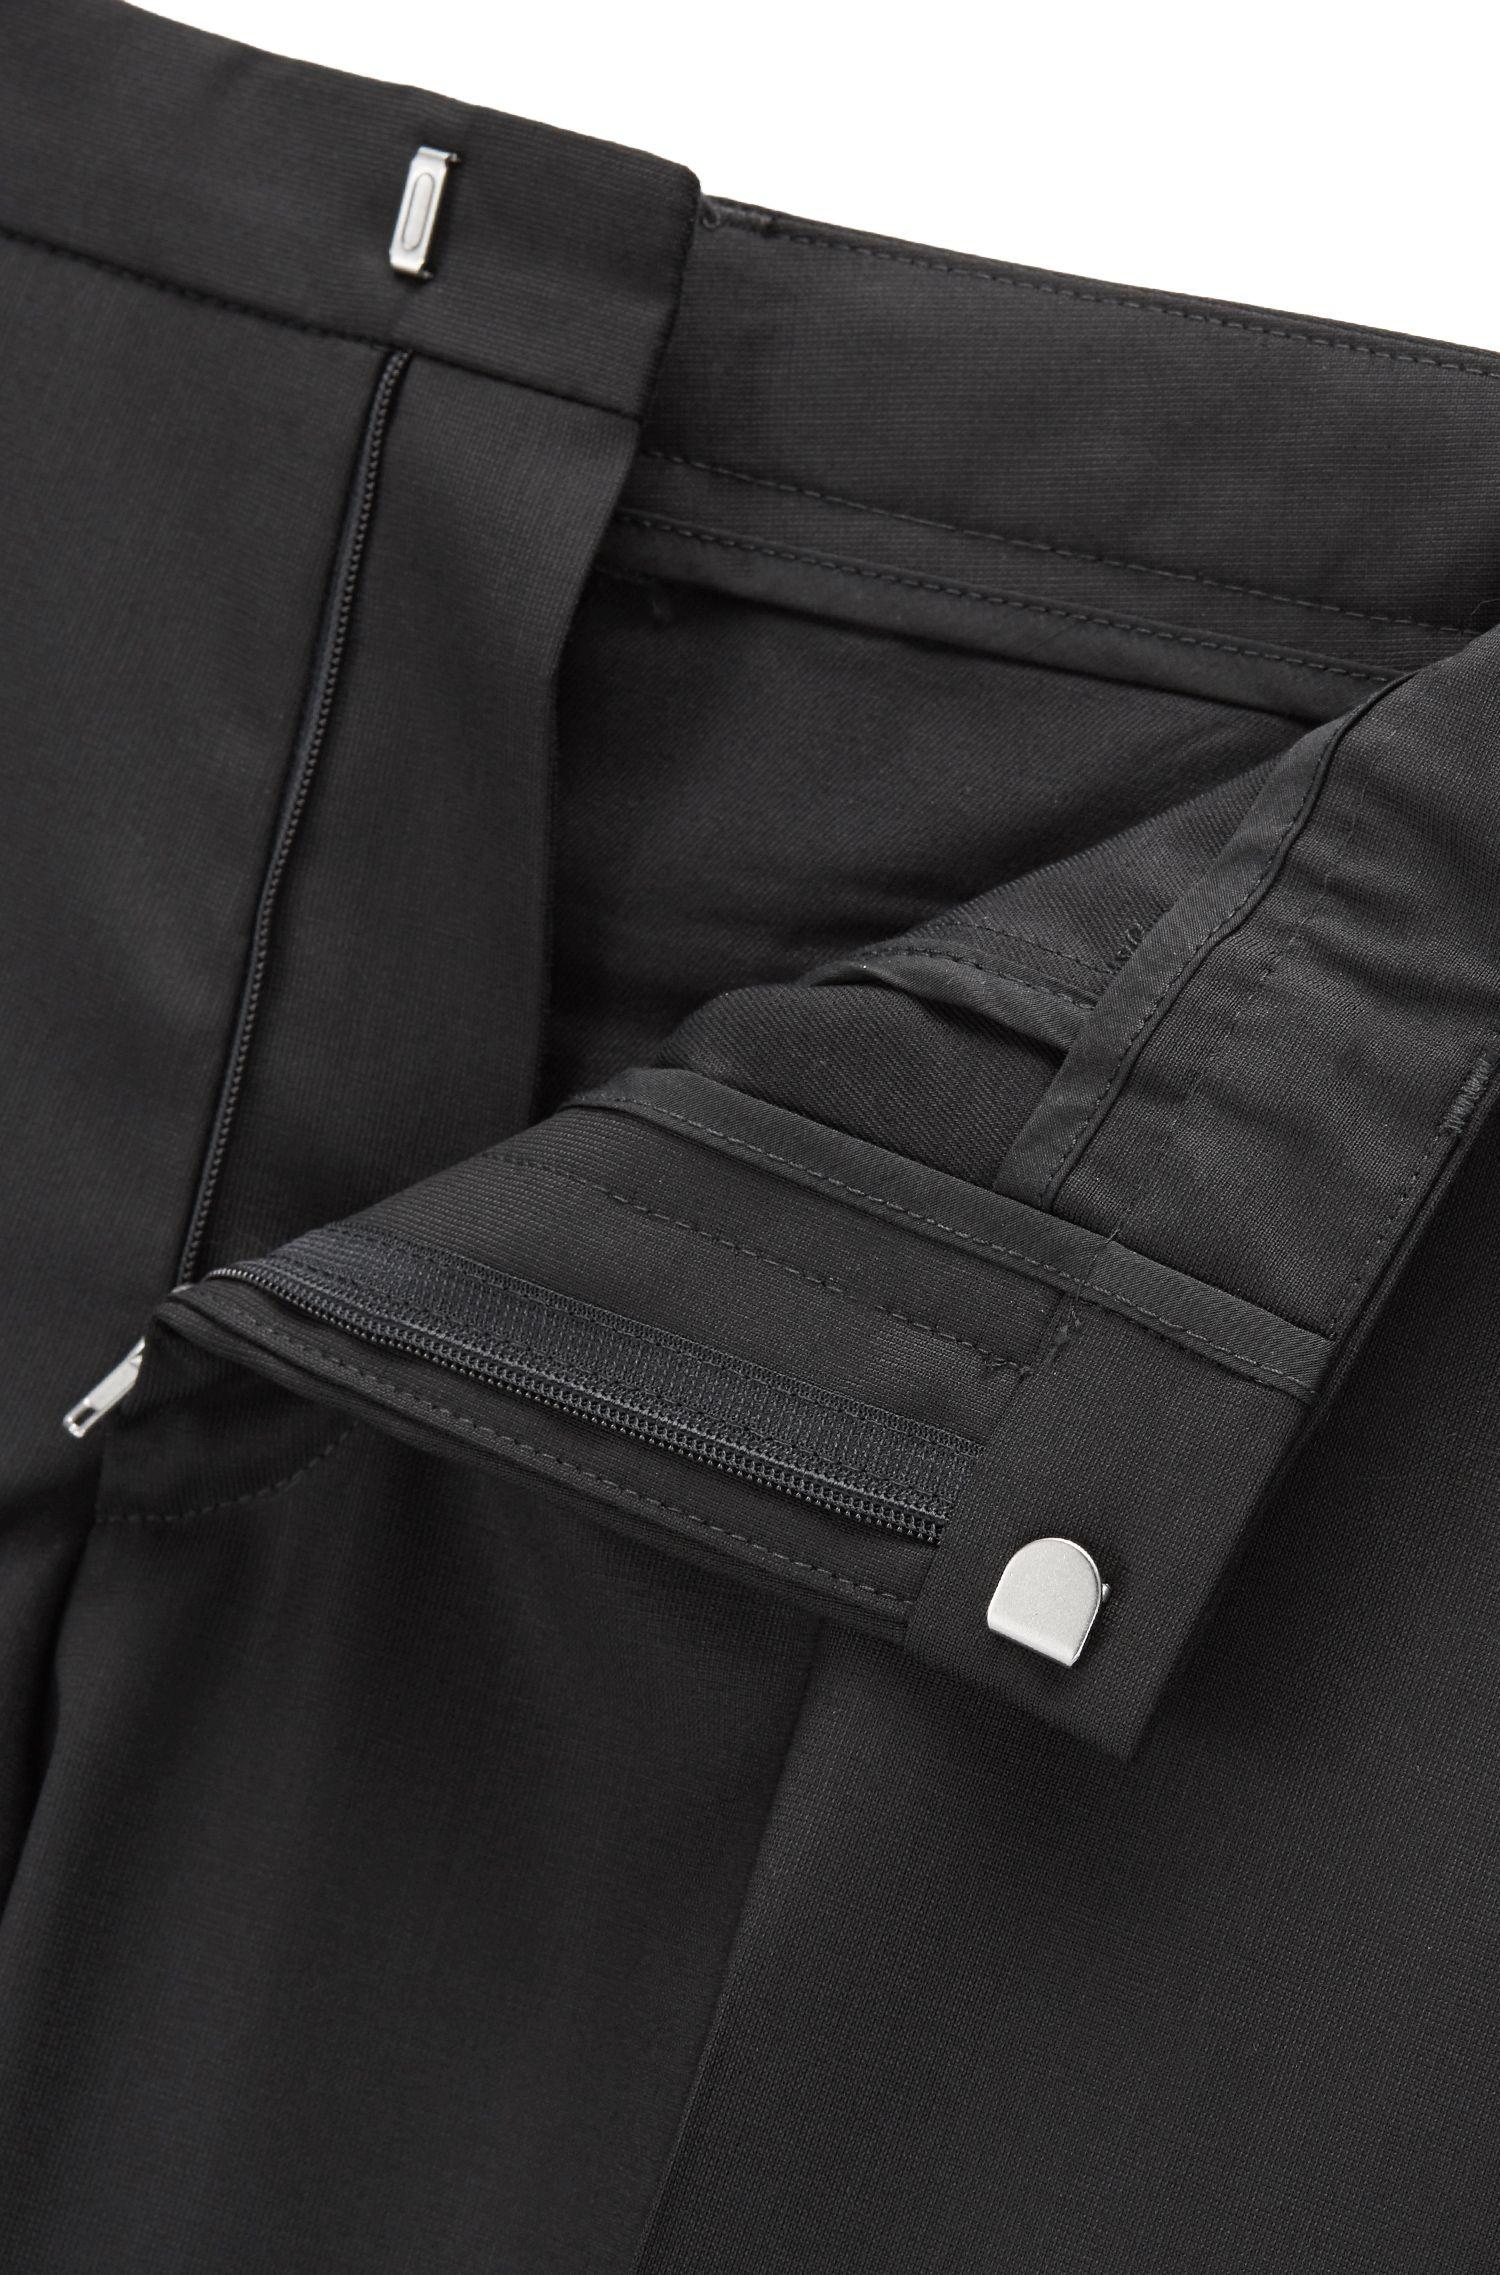 Virgin Wool 3-Piece Suit, Extra Slim Fit | Reymond/Wenton WE